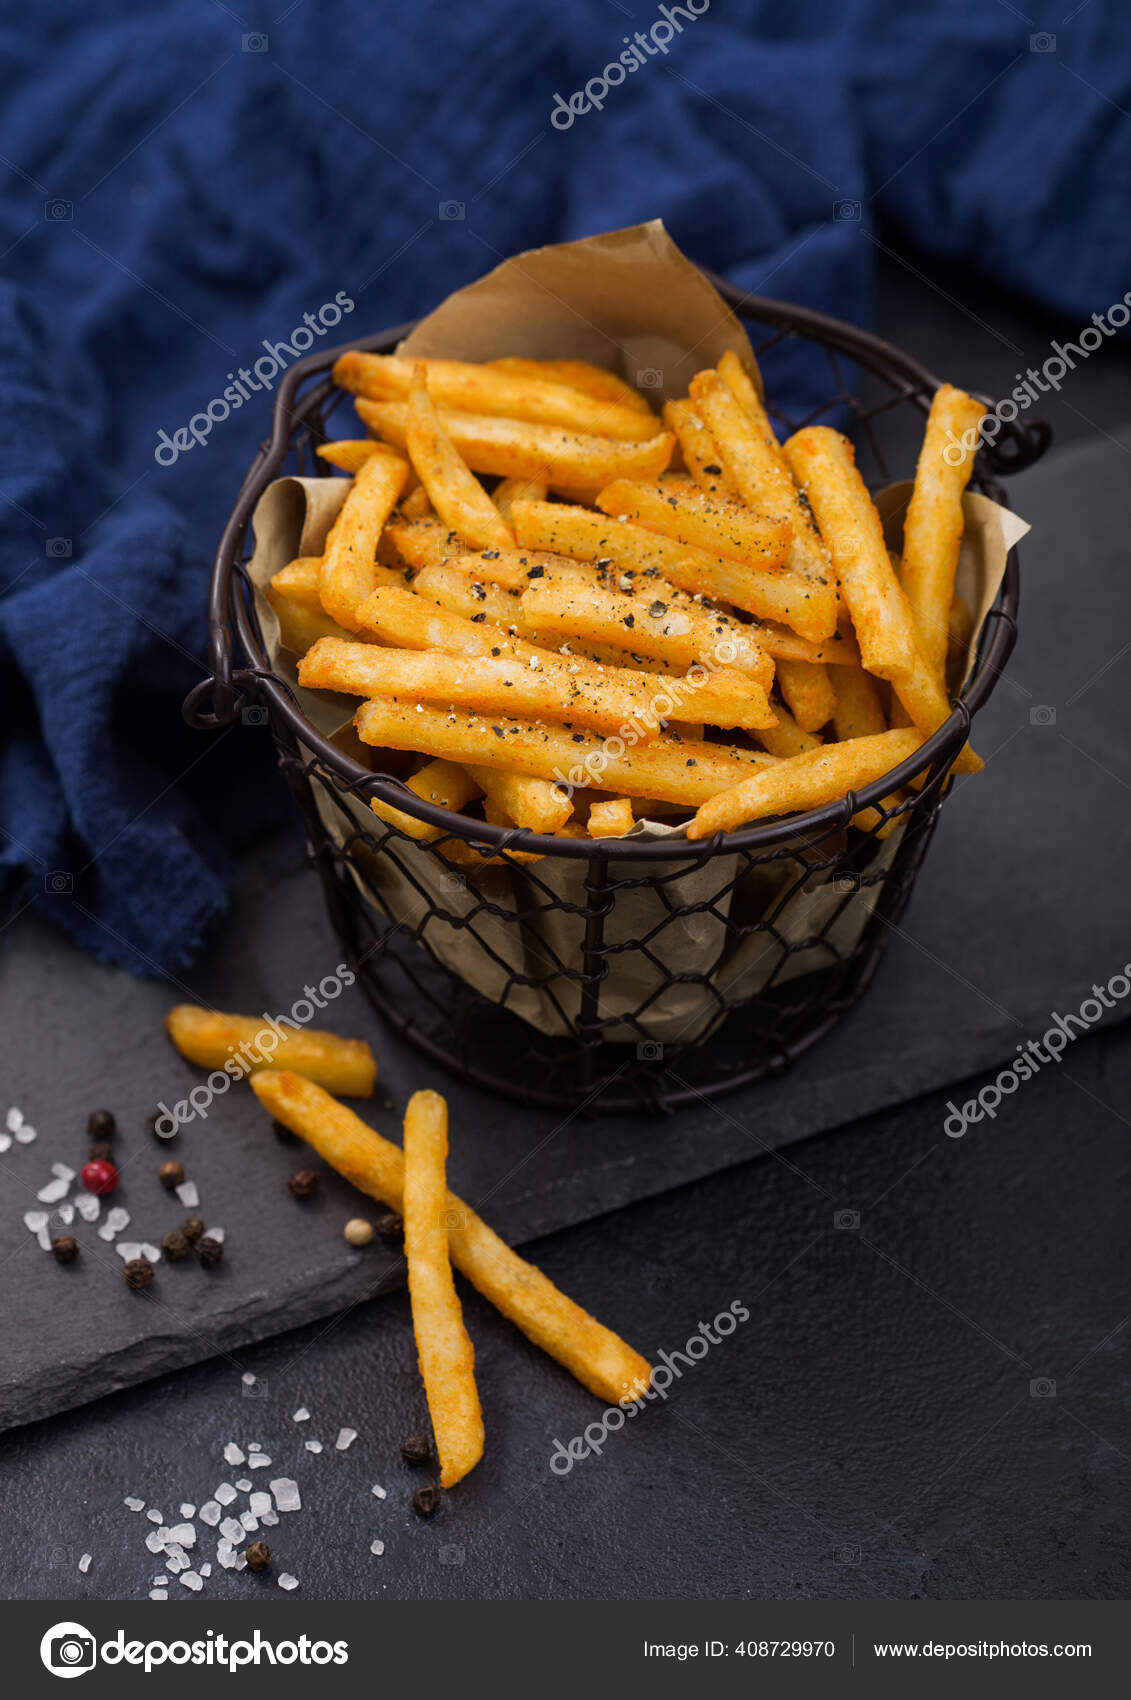 French Fries Chips Snack Bucket Black Stone Board Blue Towel Stock Photo C Denismart 408729970